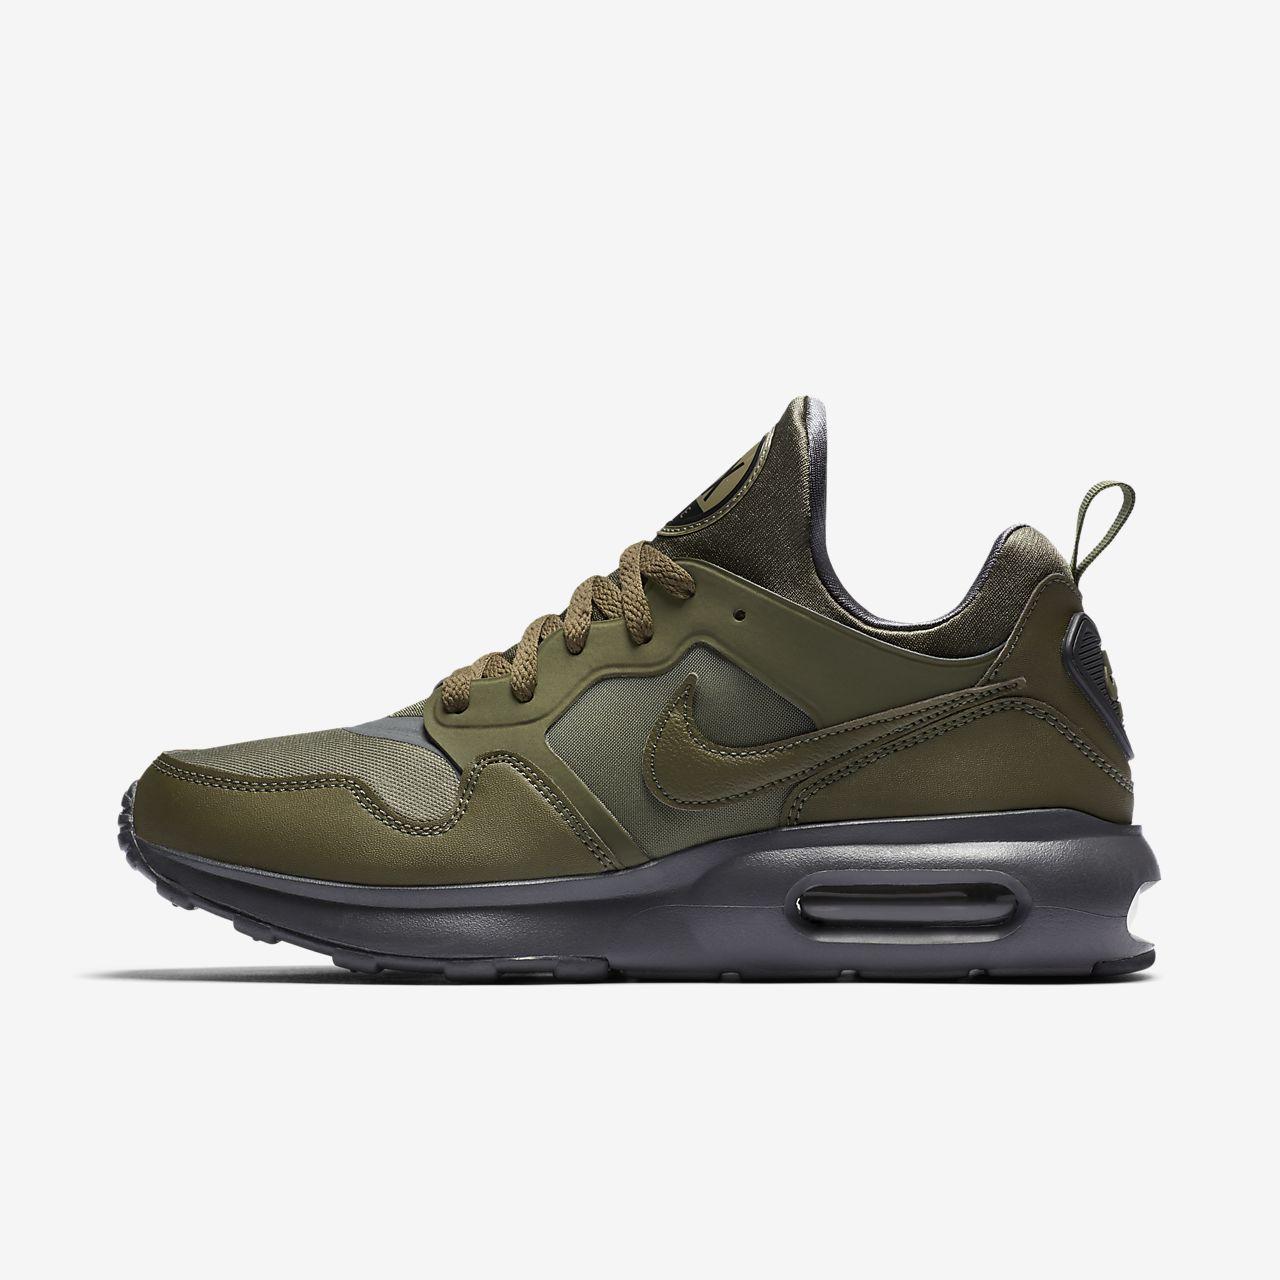 newest 3d1ea 61d6c ... order chaussure nike air max prime pour homme 4dfad d75ae